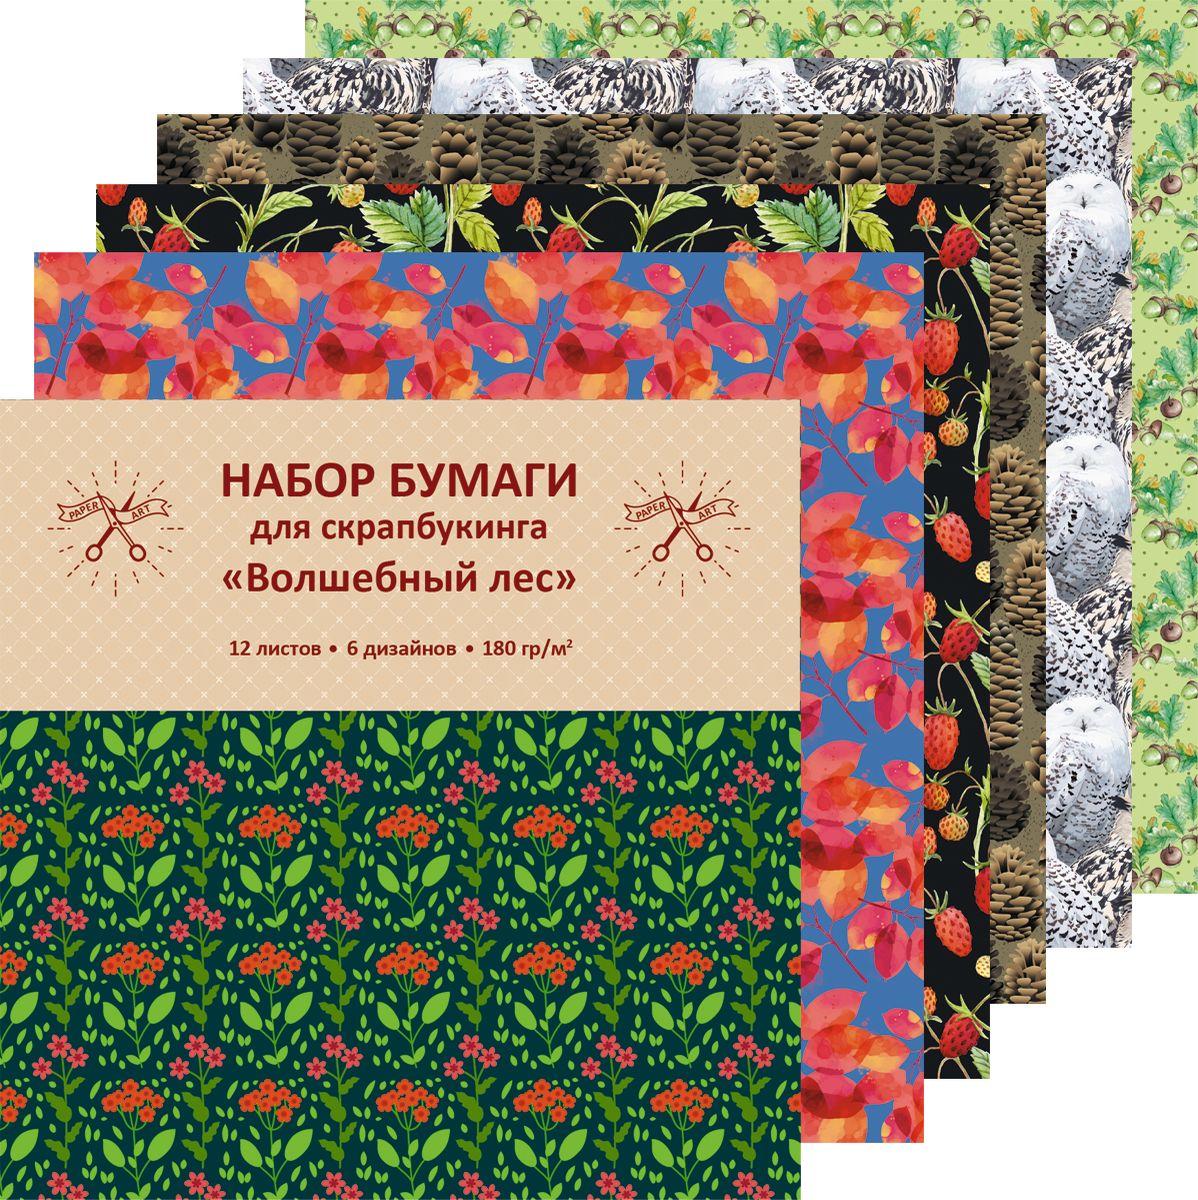 Канц-Эксмо Бумага для скрапбукинга Волшебный лес 330 х 330 мм бумага для скрапбукинга двусторонняя prima marketing parfait